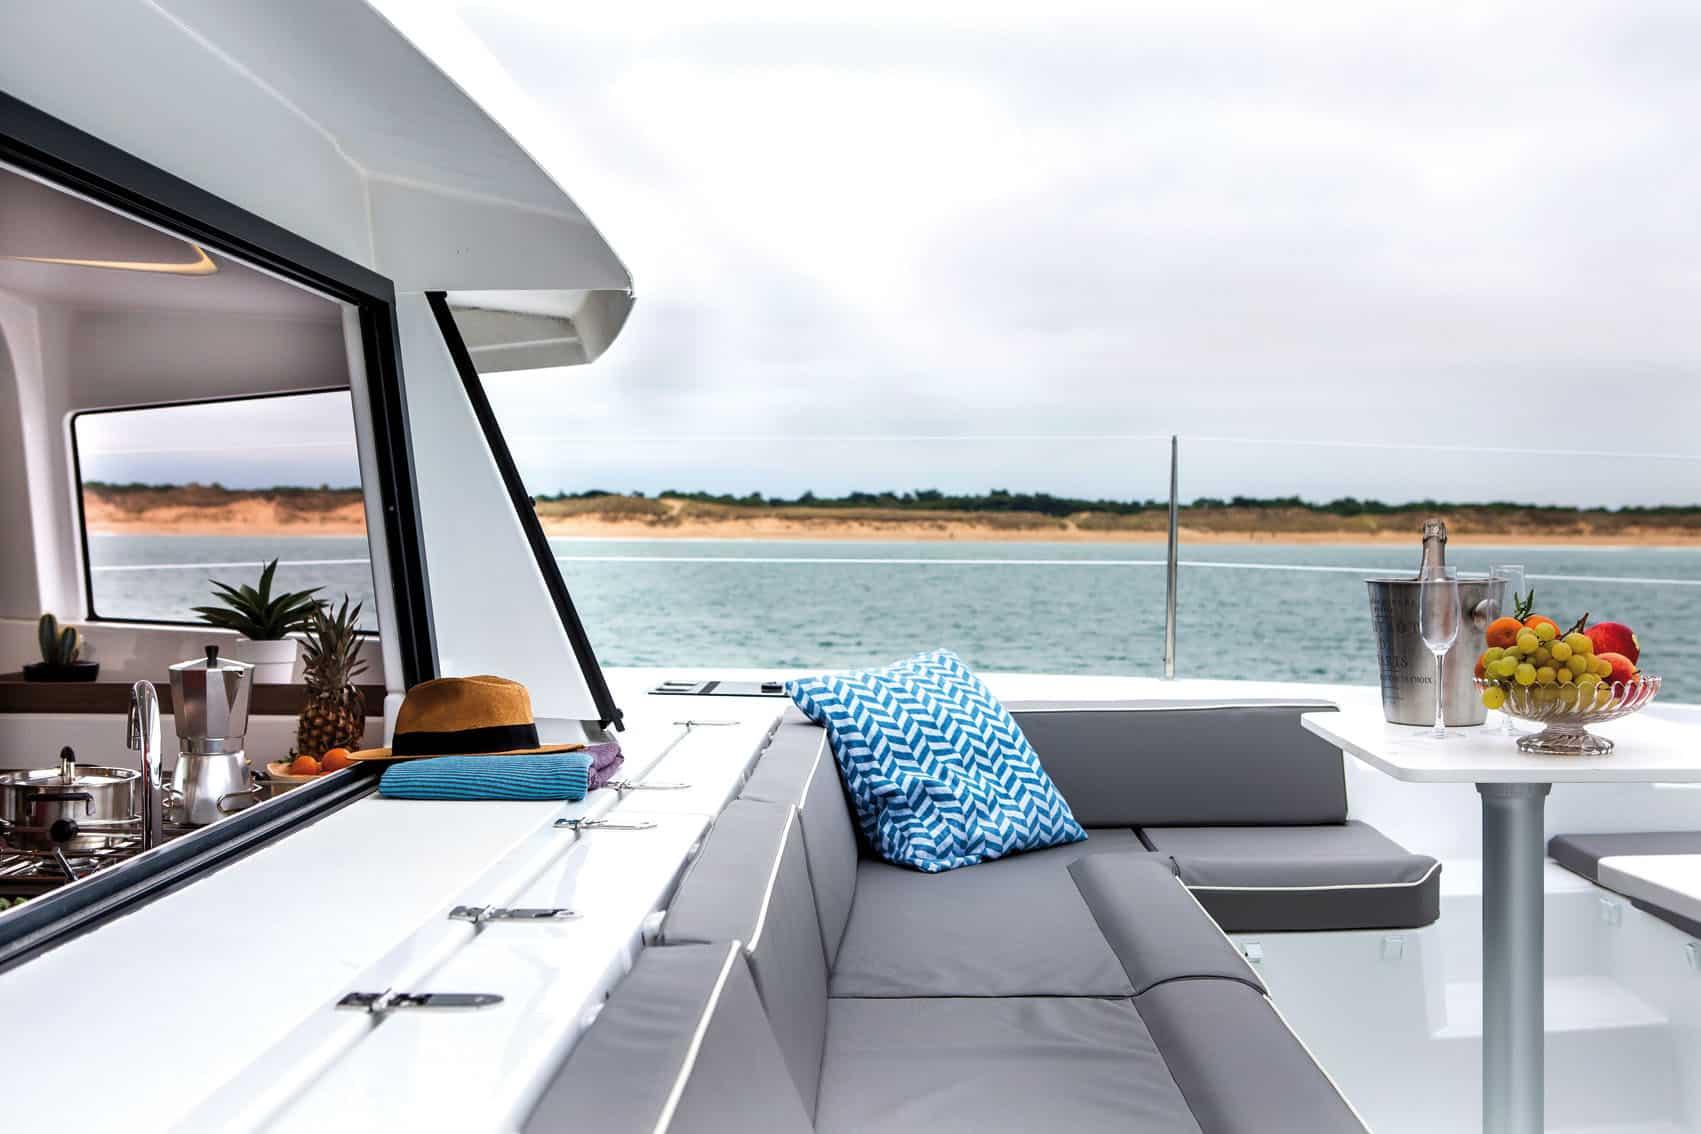 bali 4,3-yacht-charter-croatia-sailing-holidays-croatia-booking-yacht-charter-croatia-catamarans-sailboats-motorboats-gulets-luxury-yachts-boat-rental-croatia